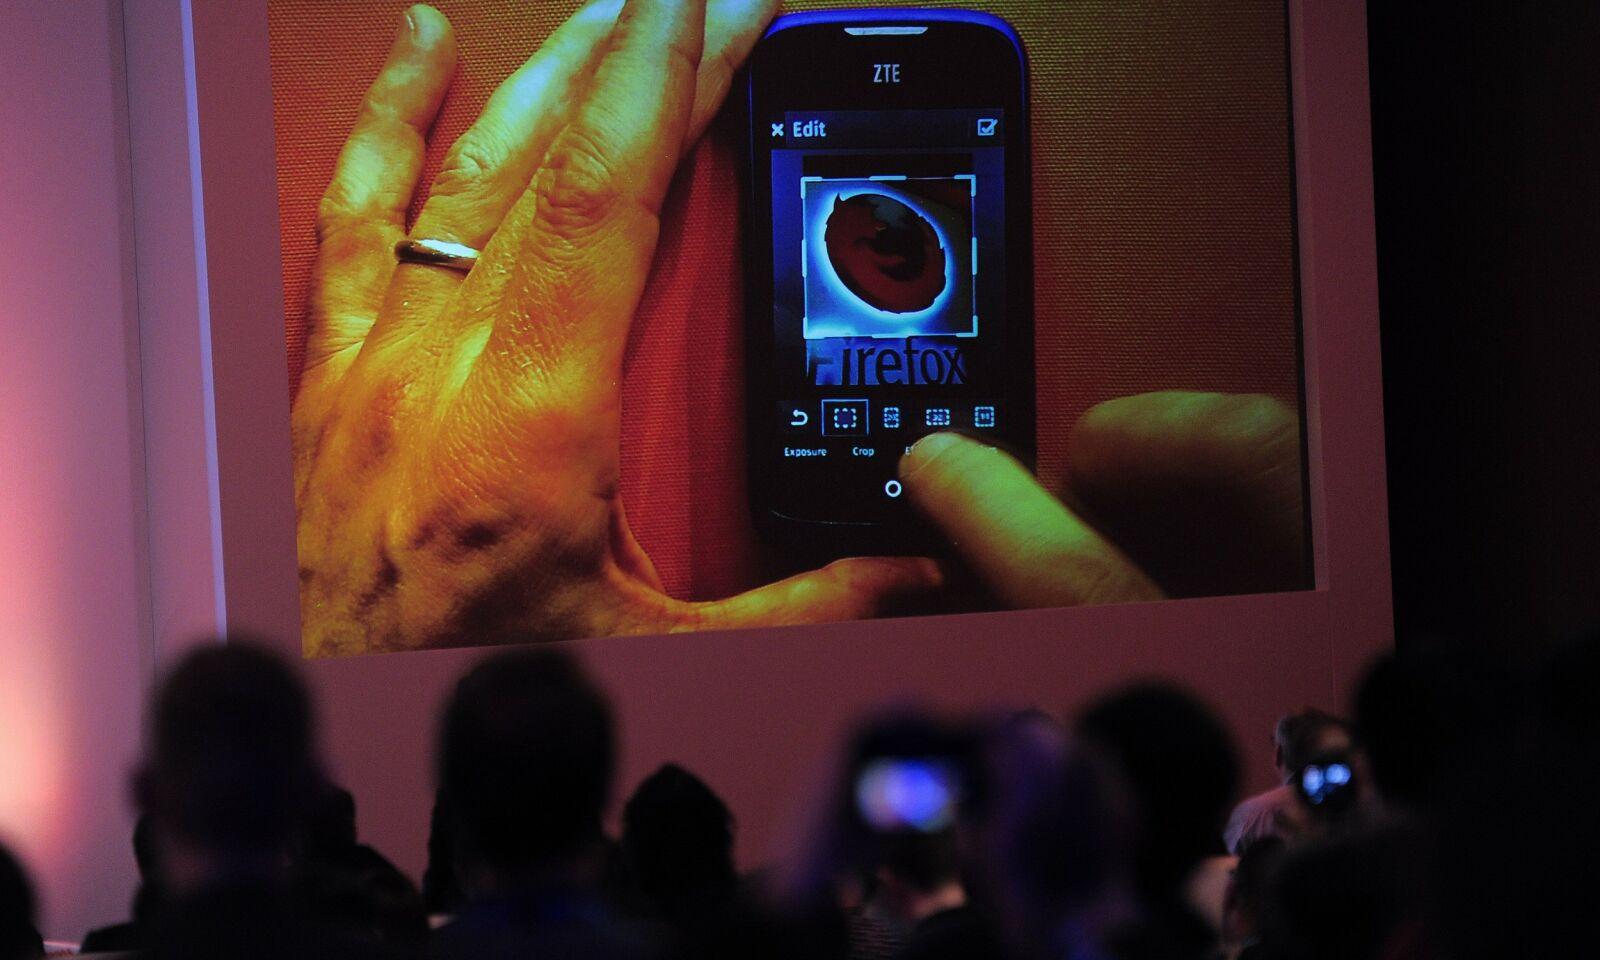 Tilskuere følger spent med på Firefox OS-avløringen på Mobile World Conference 2013 i Barcelona. 📸: NTB Scanpix / Josep Lago / AFP